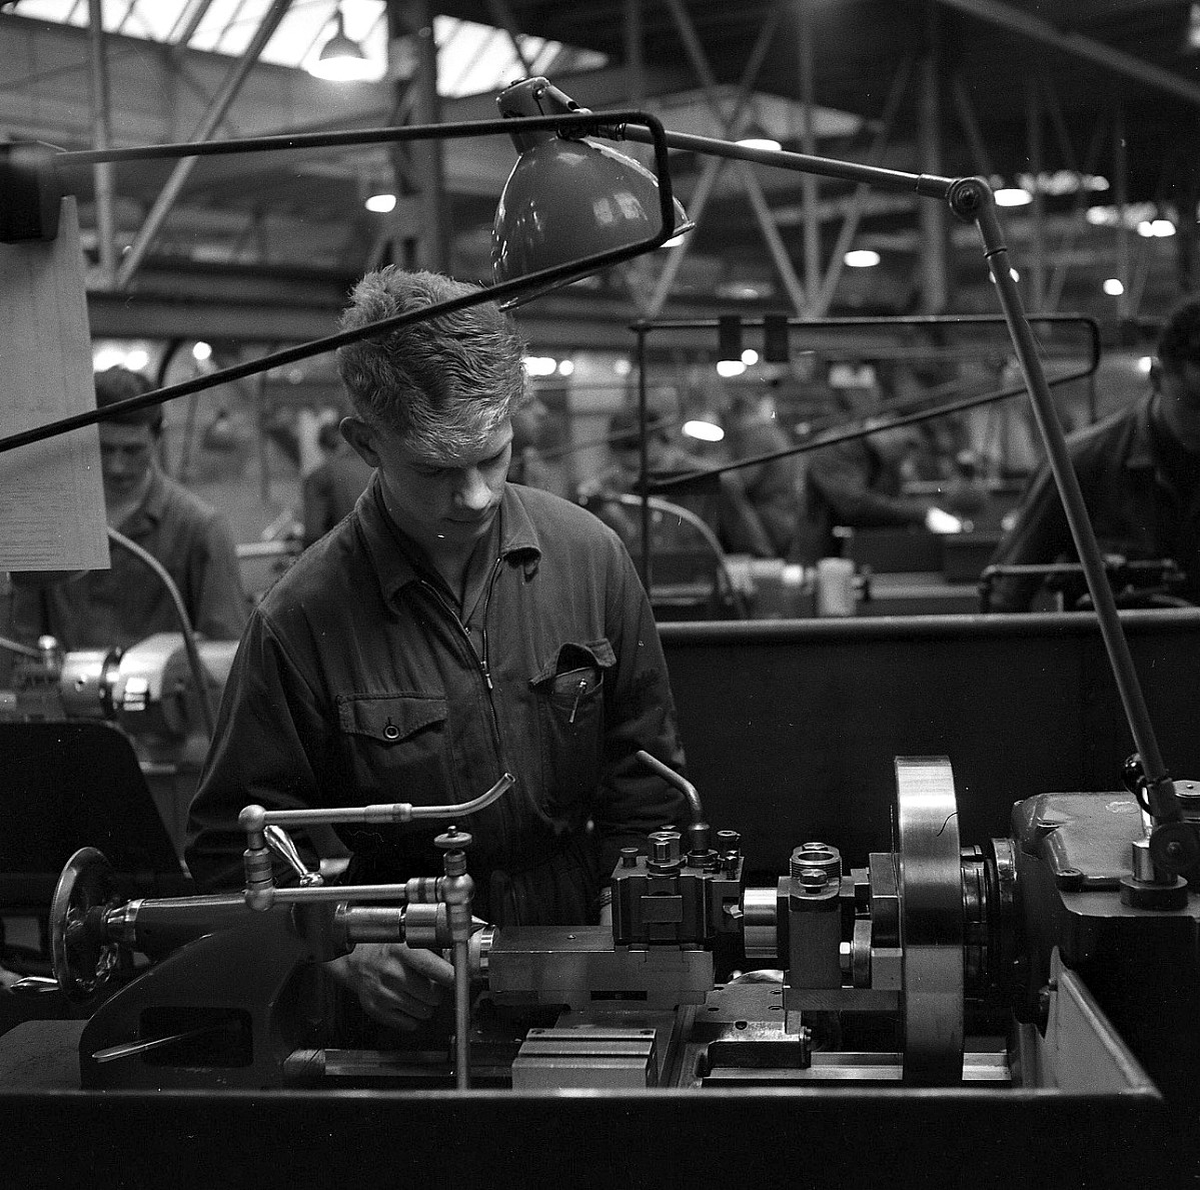 GFA 17/650072.39: Reportage: vocational training of technical draftsmen